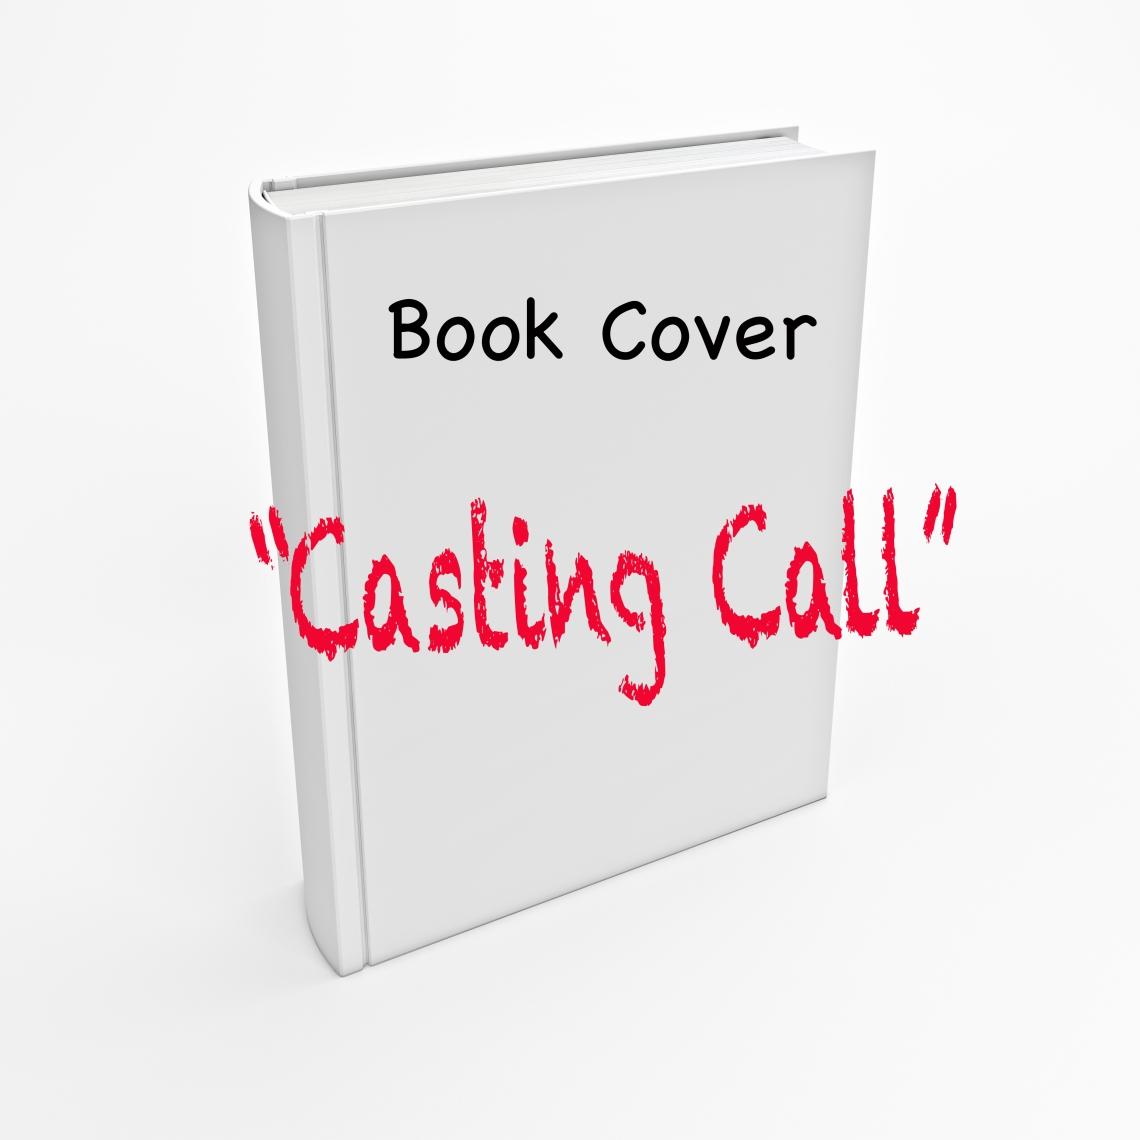 BookCoverCasting Call